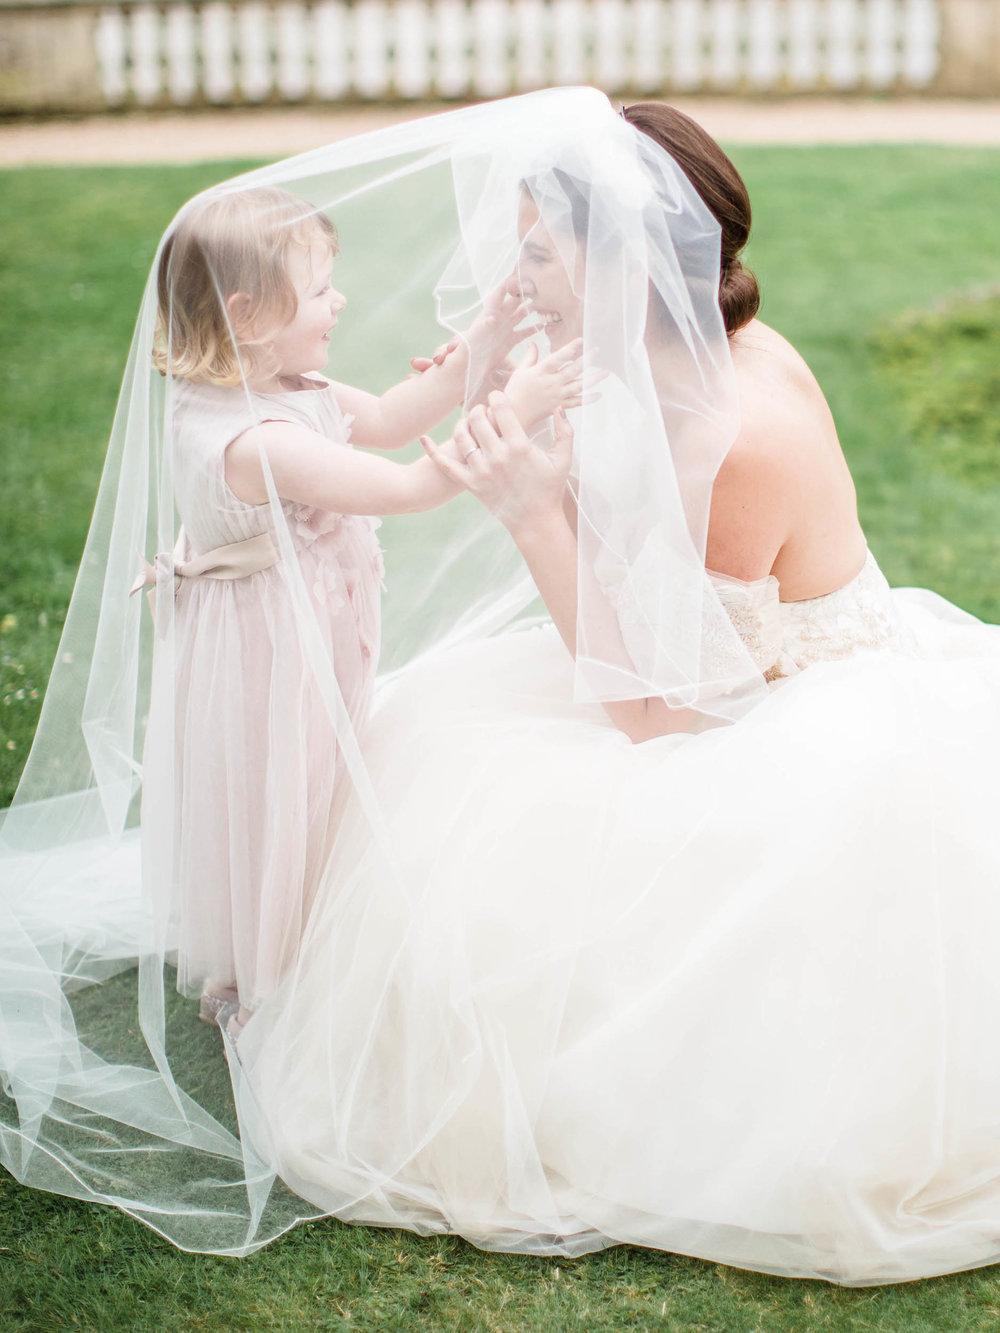 Amy O'Boyle Photography- Destination & UK Fine Art Film Wedding Photographer- Stoneleigh Abbey Wedding-16.jpg